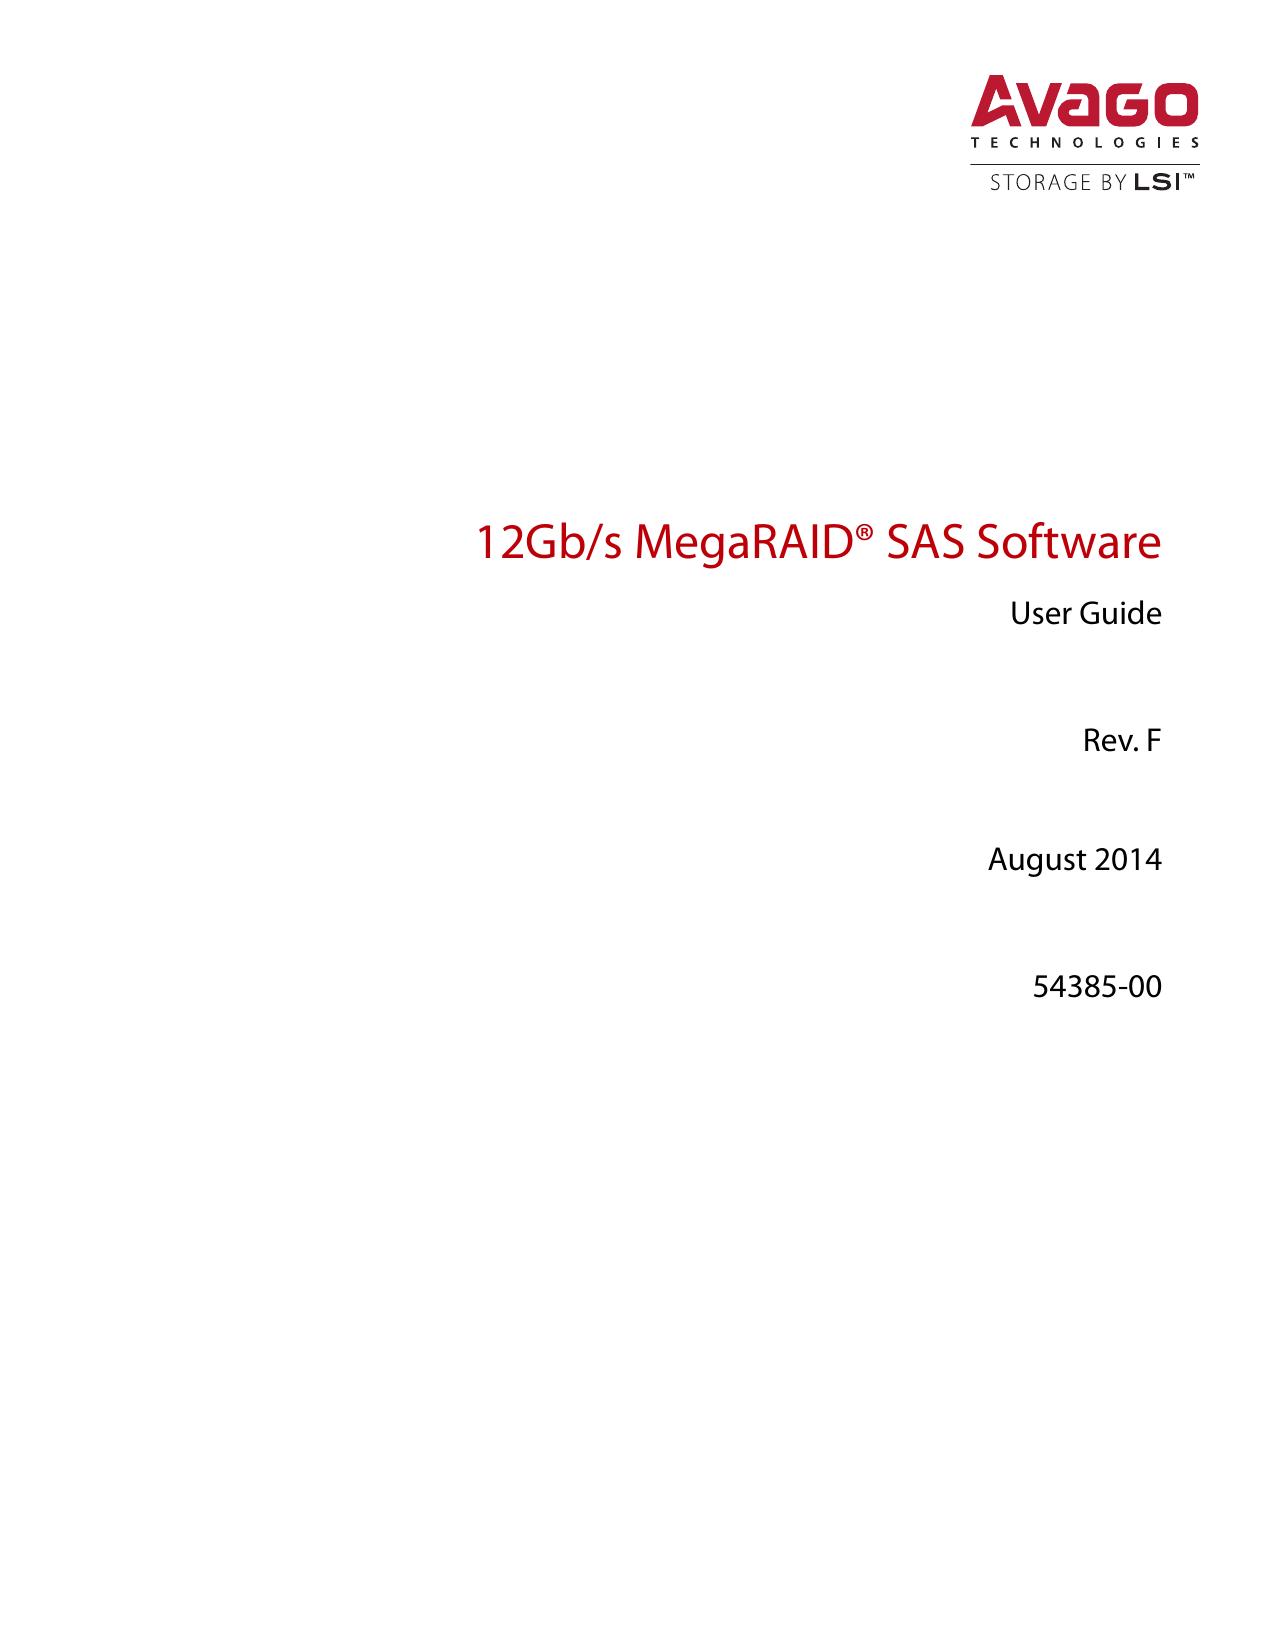 Avago Technologies/LSI 12 Gb/s MegaRAID SAS Software